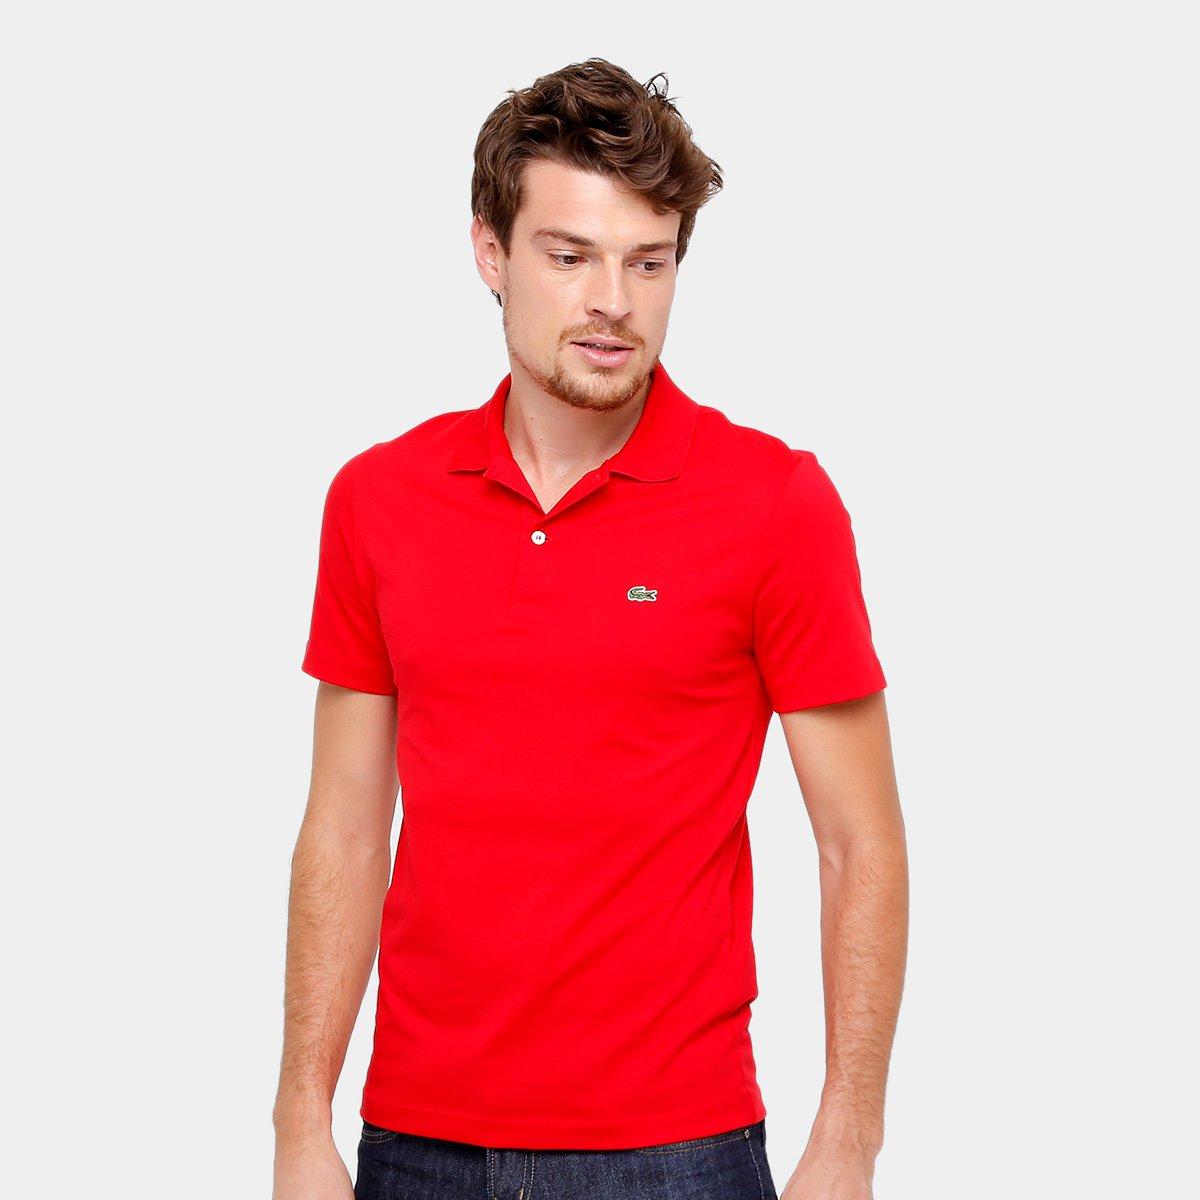 f075bd45410ea Camisa Polo Lacoste Malha Original Fit Masculina - Vermelho - Compre ...